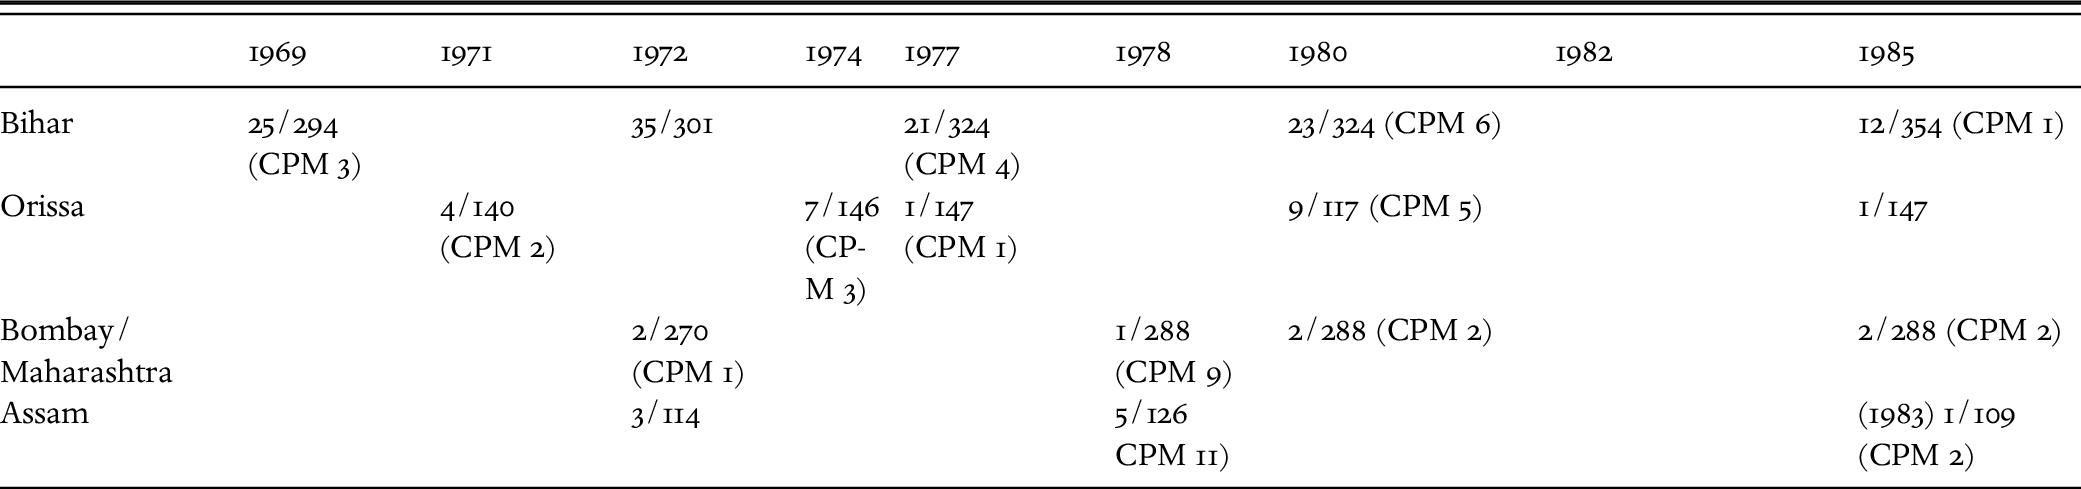 Soviet Communist Party Membership Book Registration Card USSR CCCP # Worn Cover